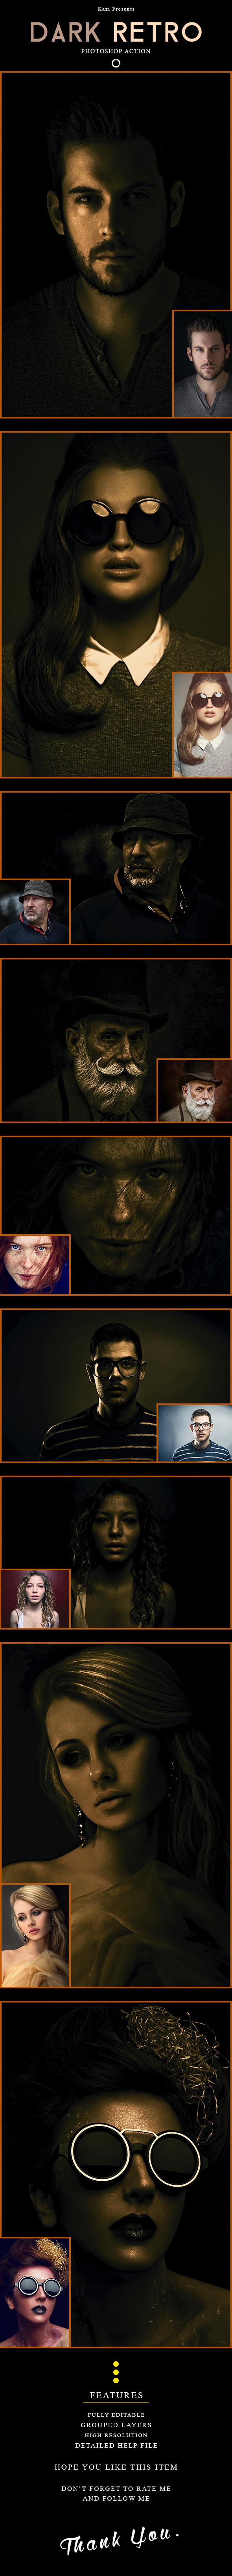 Dark Retro Action - Photo Effects Actions